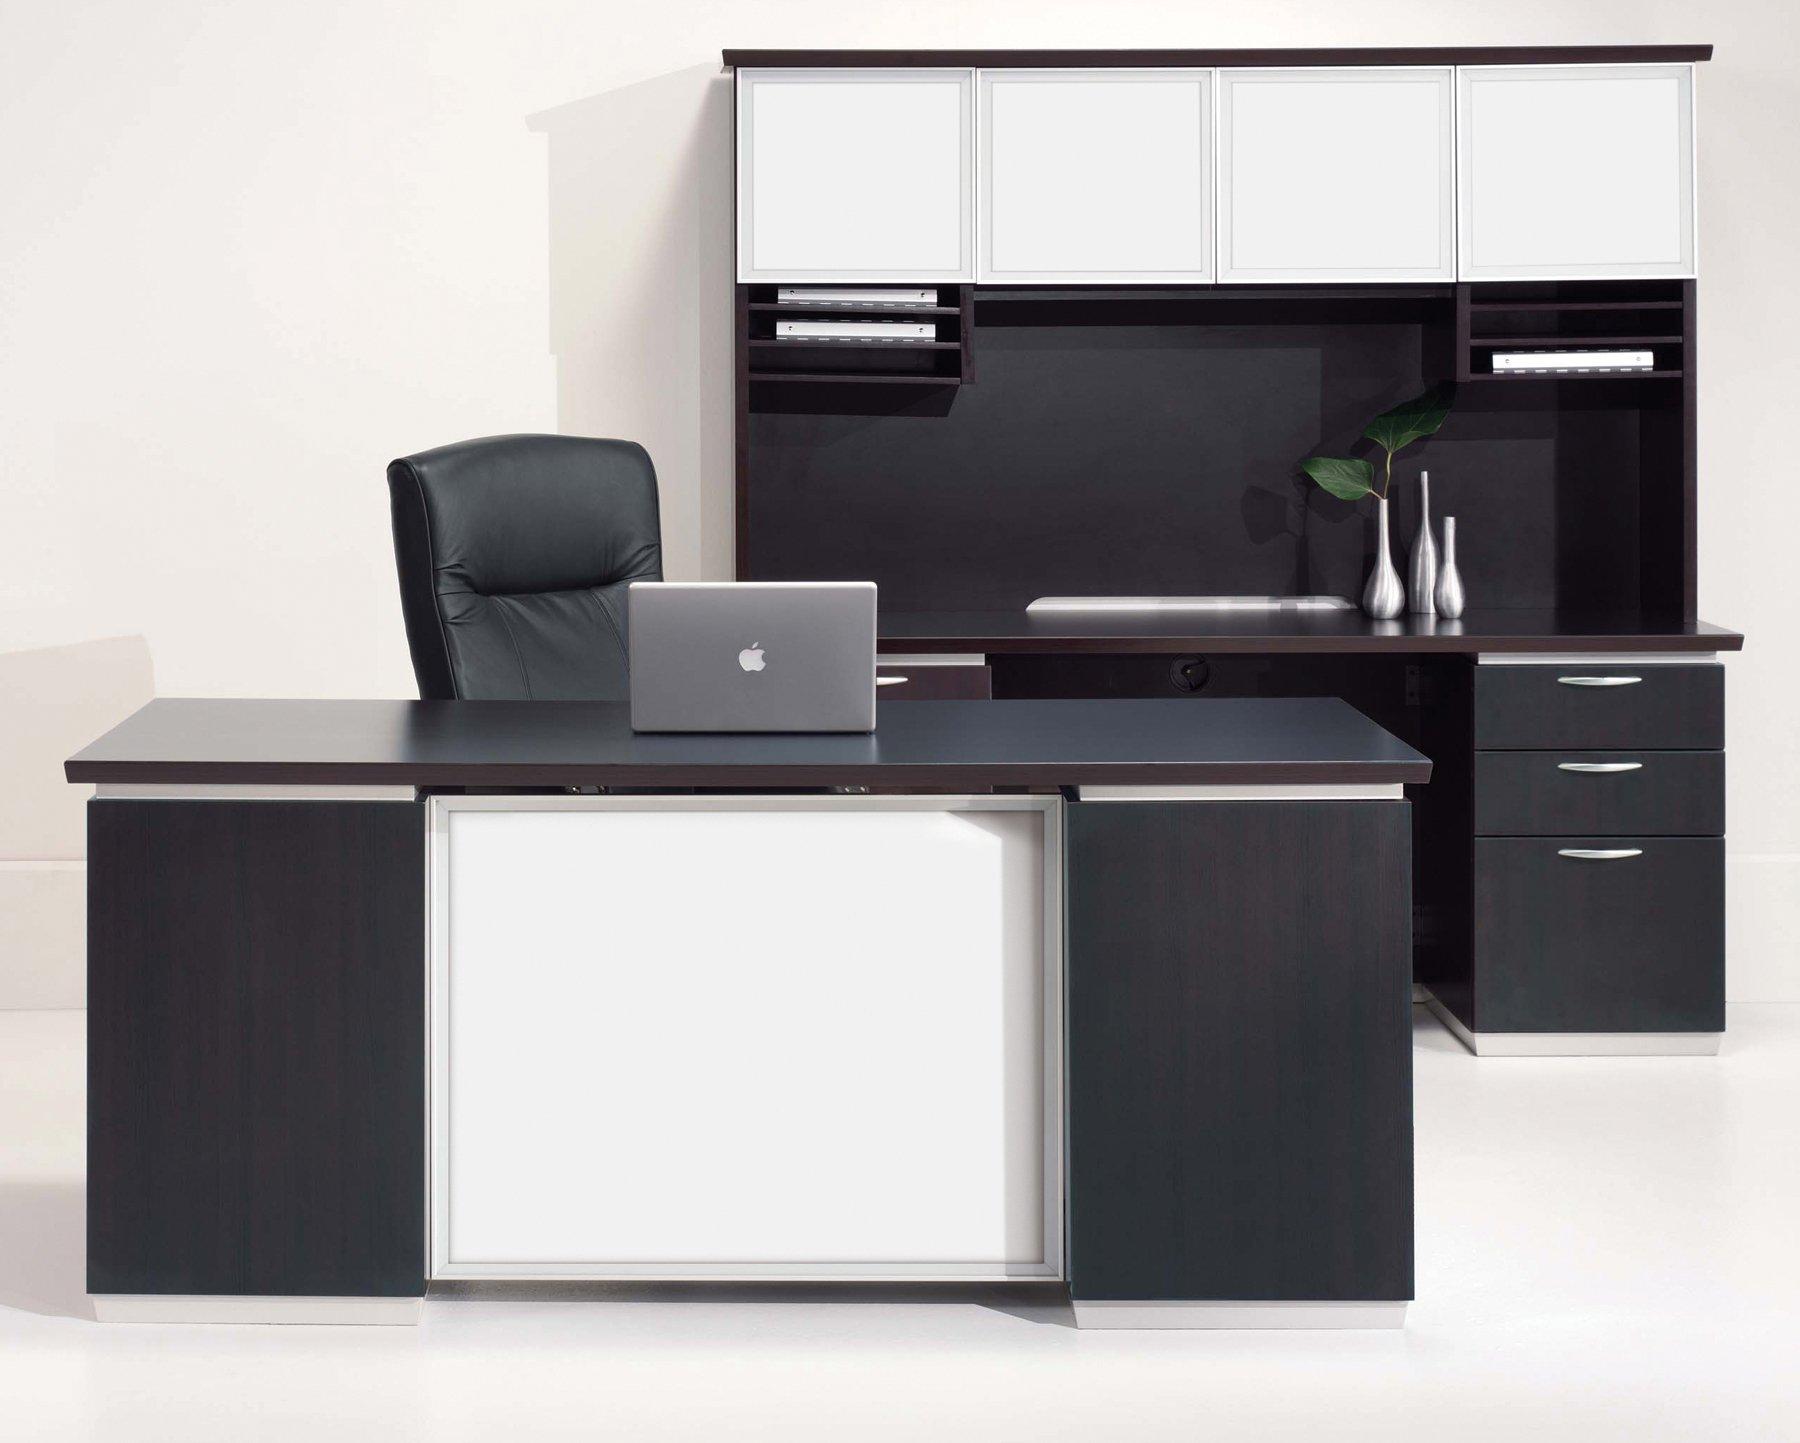 Flexsteel Pimlico  Executive Desk with White Glass Modesty Panel